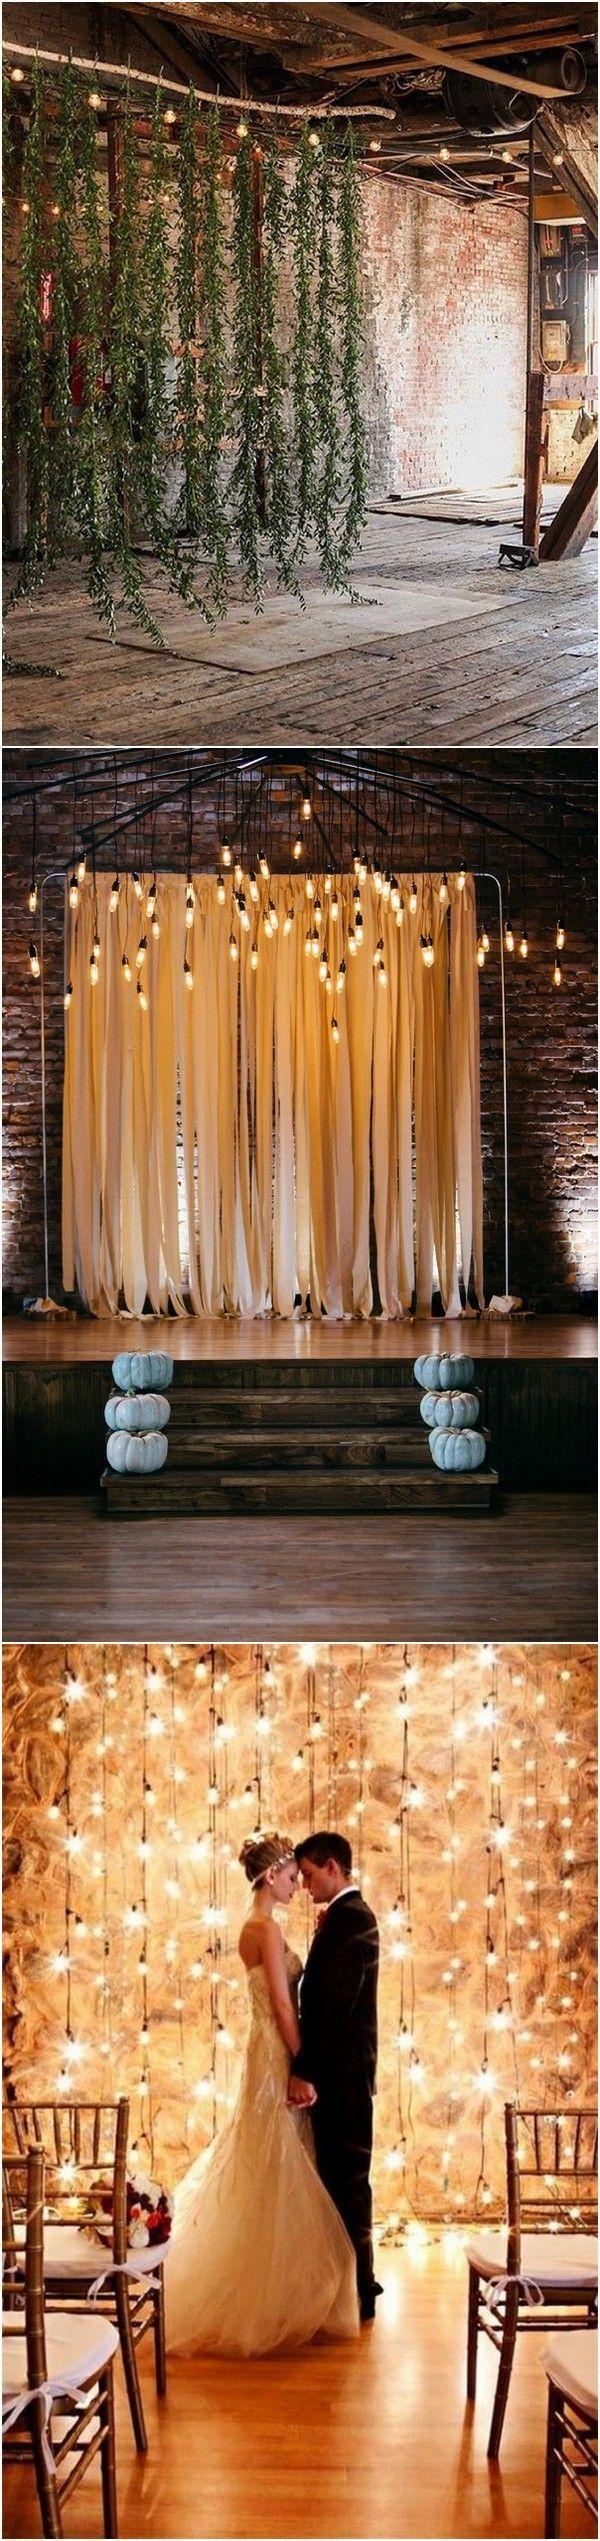 edison bulb lighting wedding backdrop ideas_